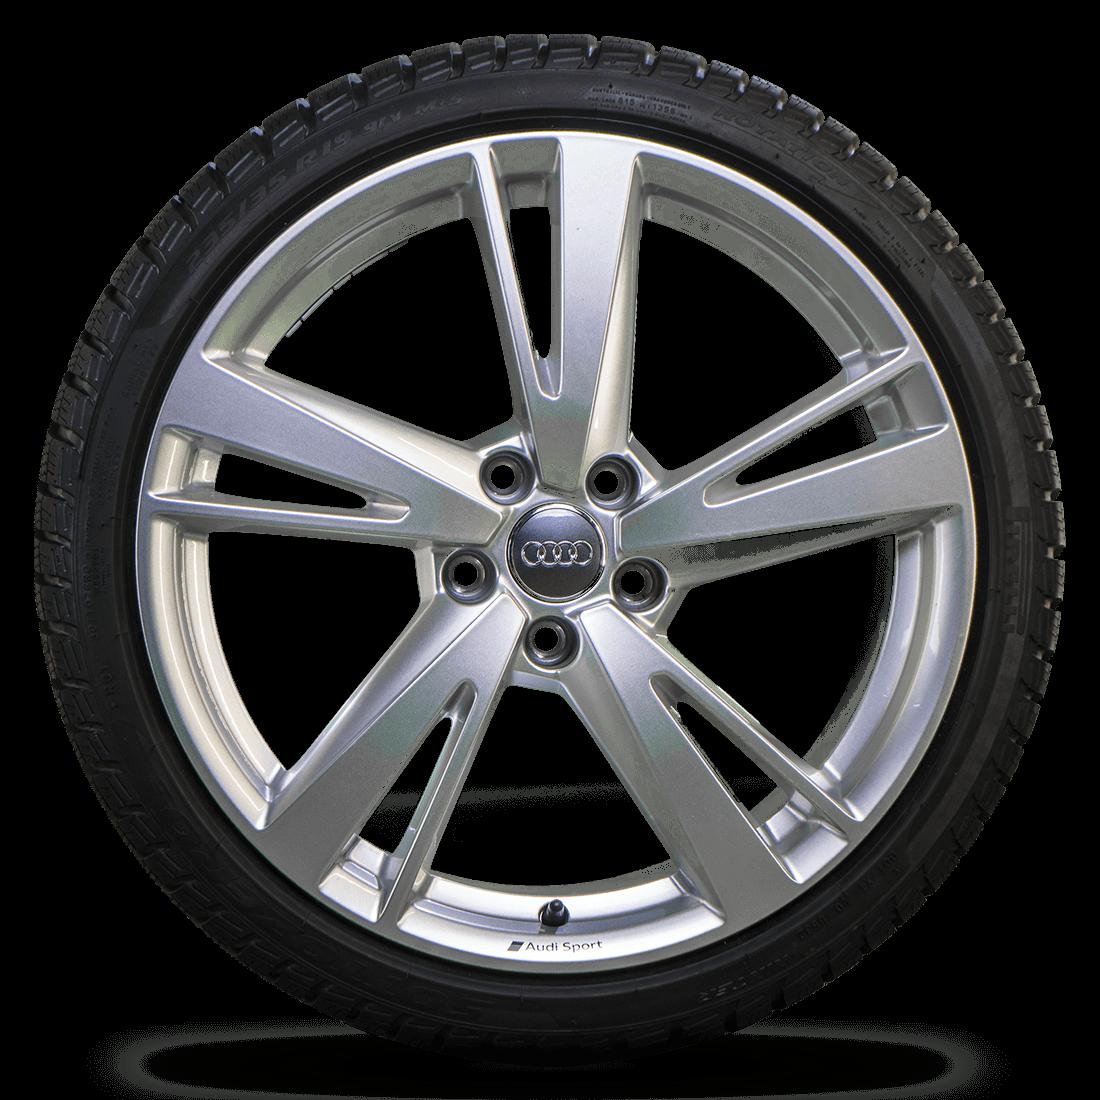 Audi 19 Inch Rims RS3 8V Blade Winter Tires Winter Wheels